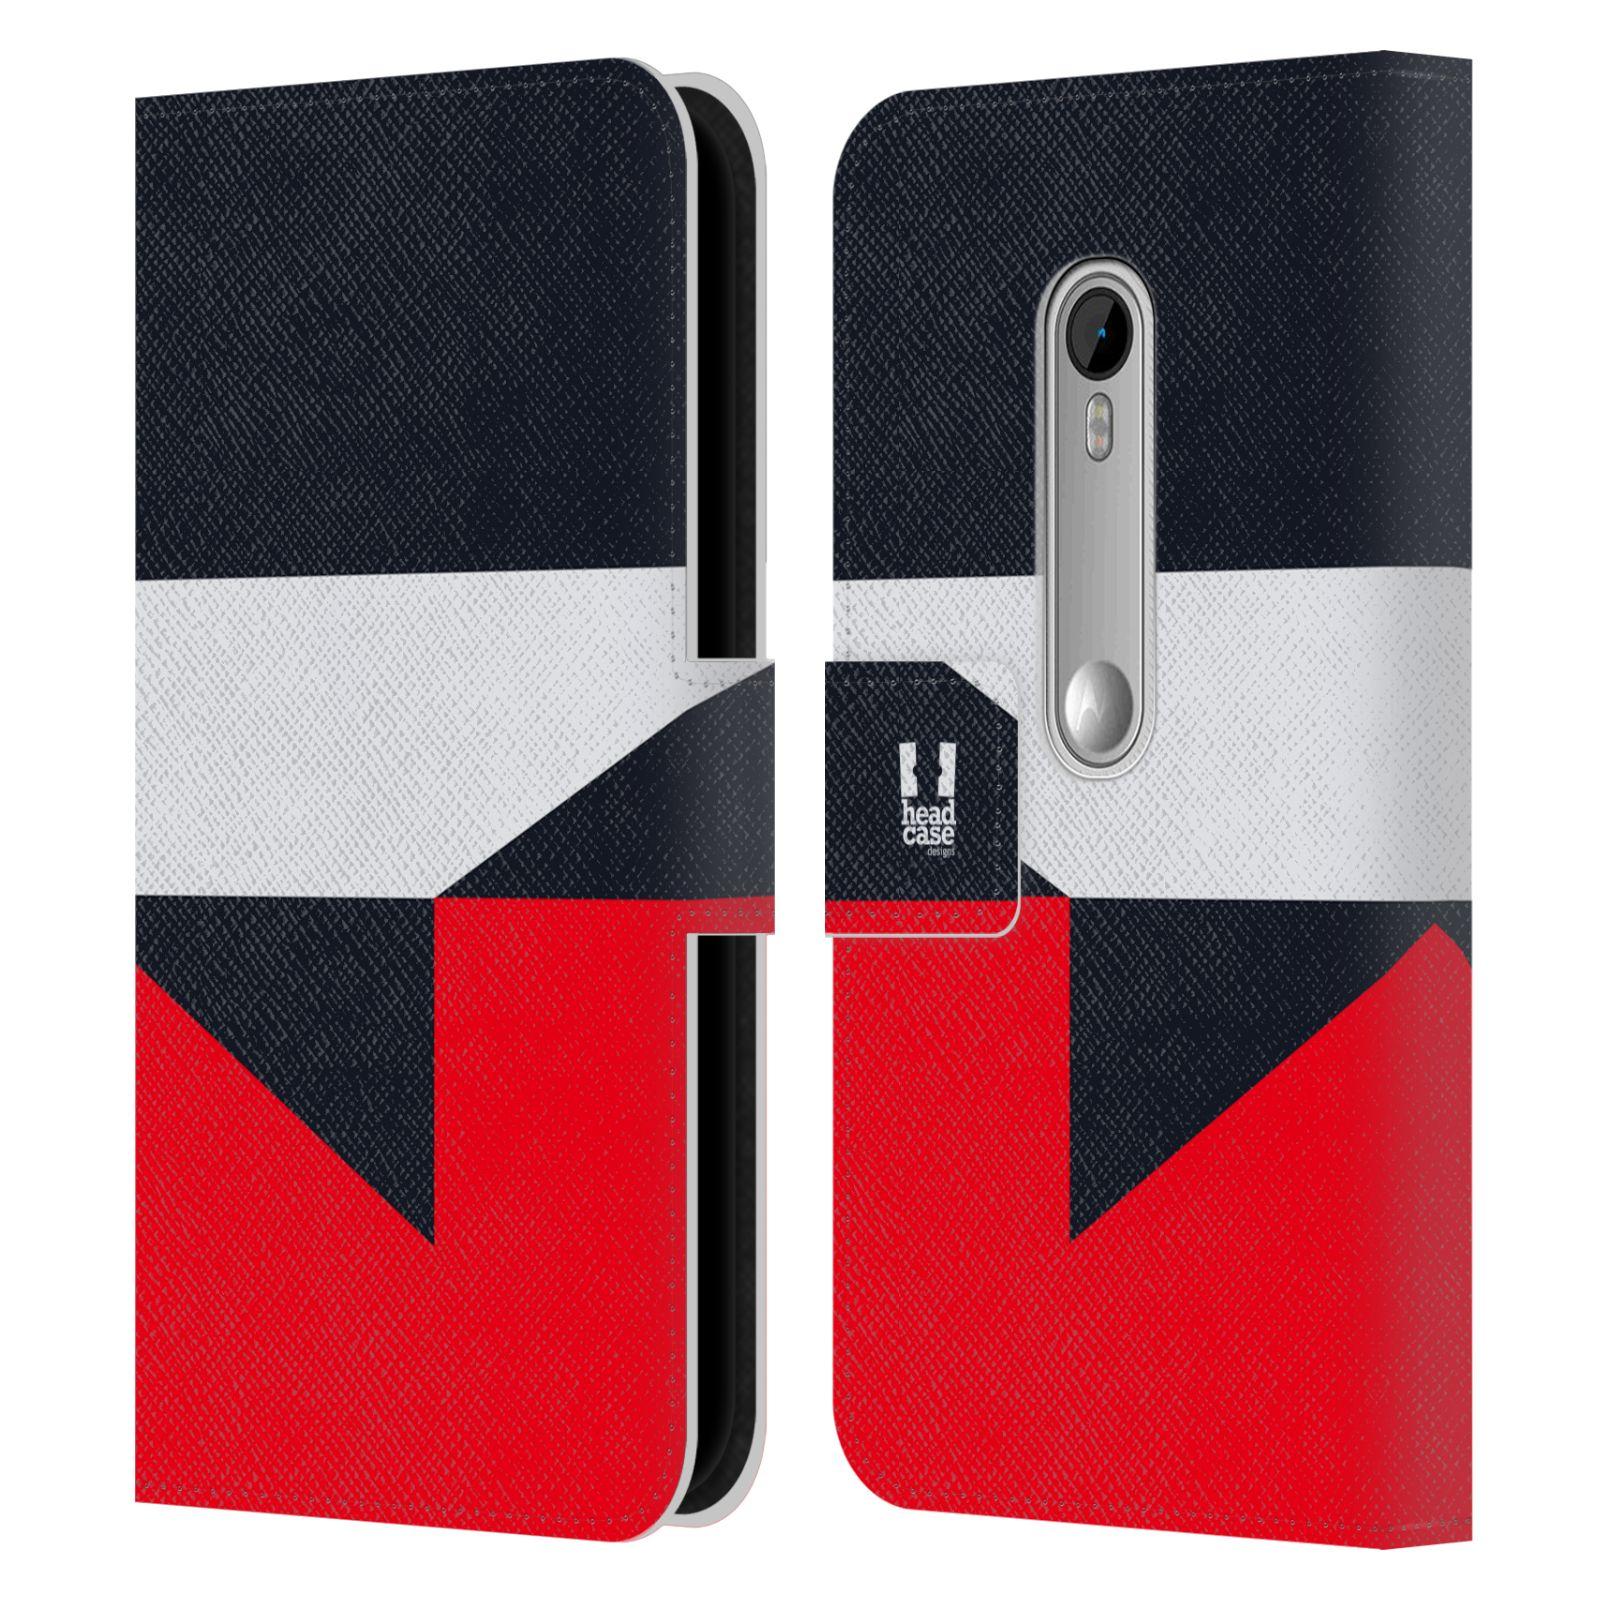 HEAD CASE Flipové pouzdro pro mobil Motorola MOTO G 3RD GENERATION barevné tvary černá a červená gejša